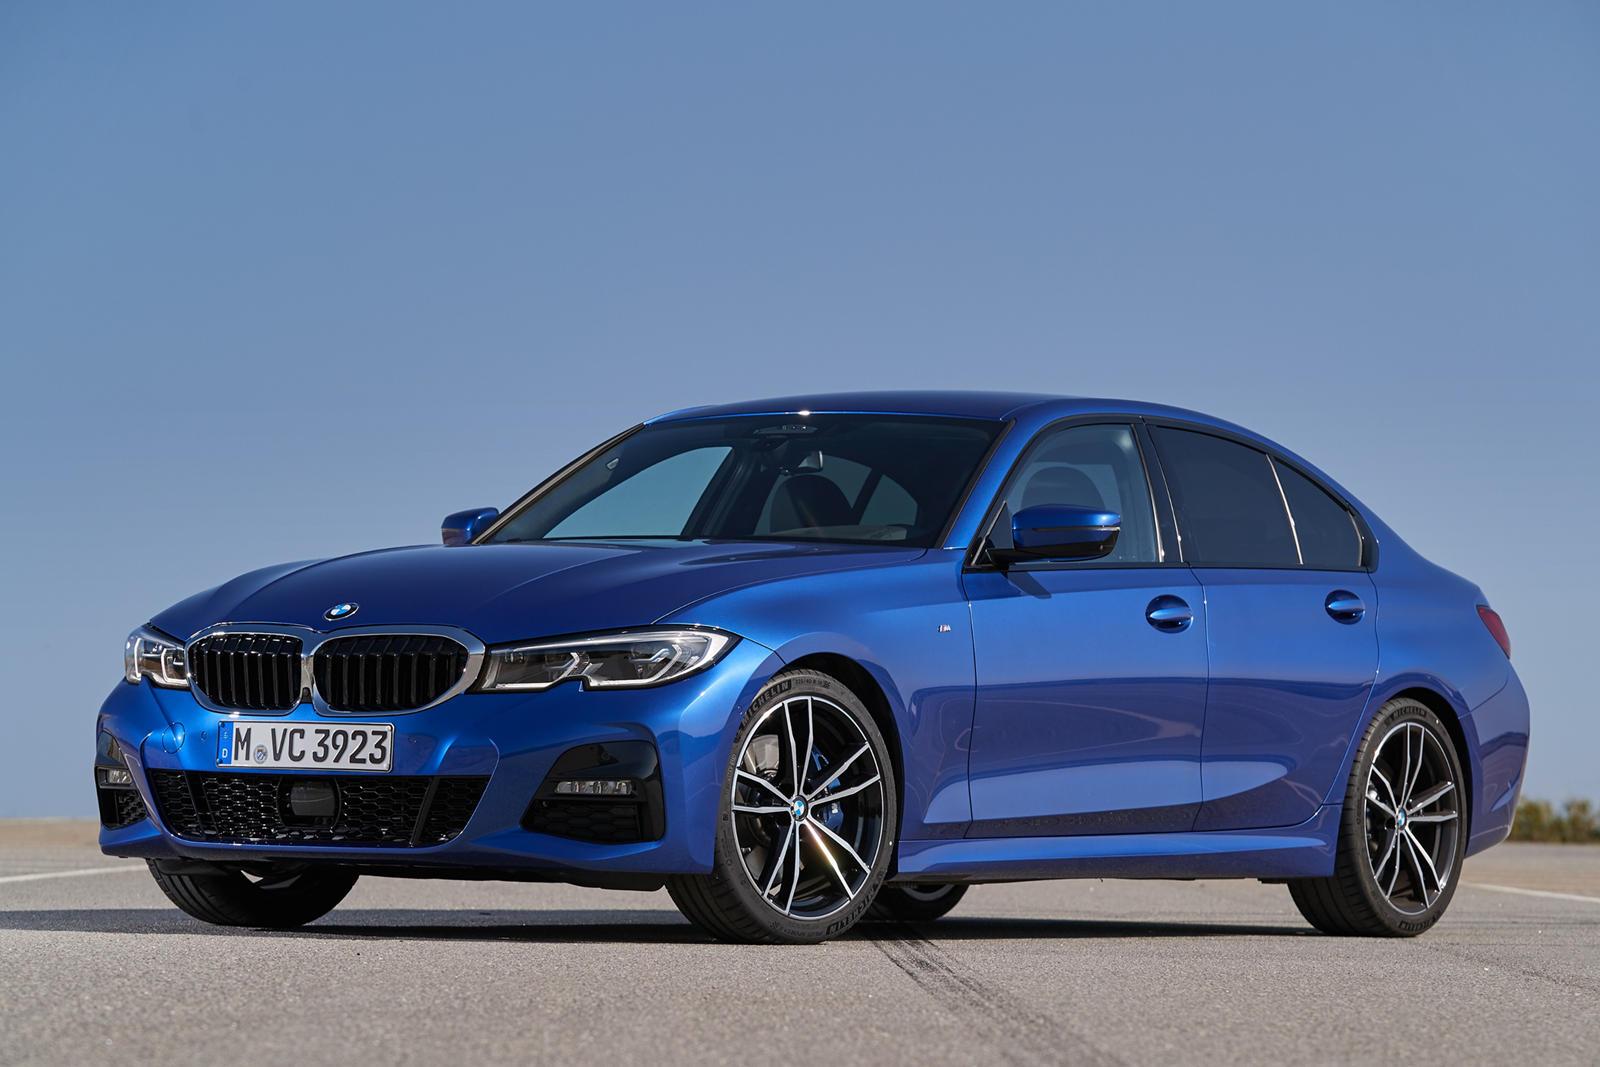 2020 BMW 3 Series Exterior and Interior